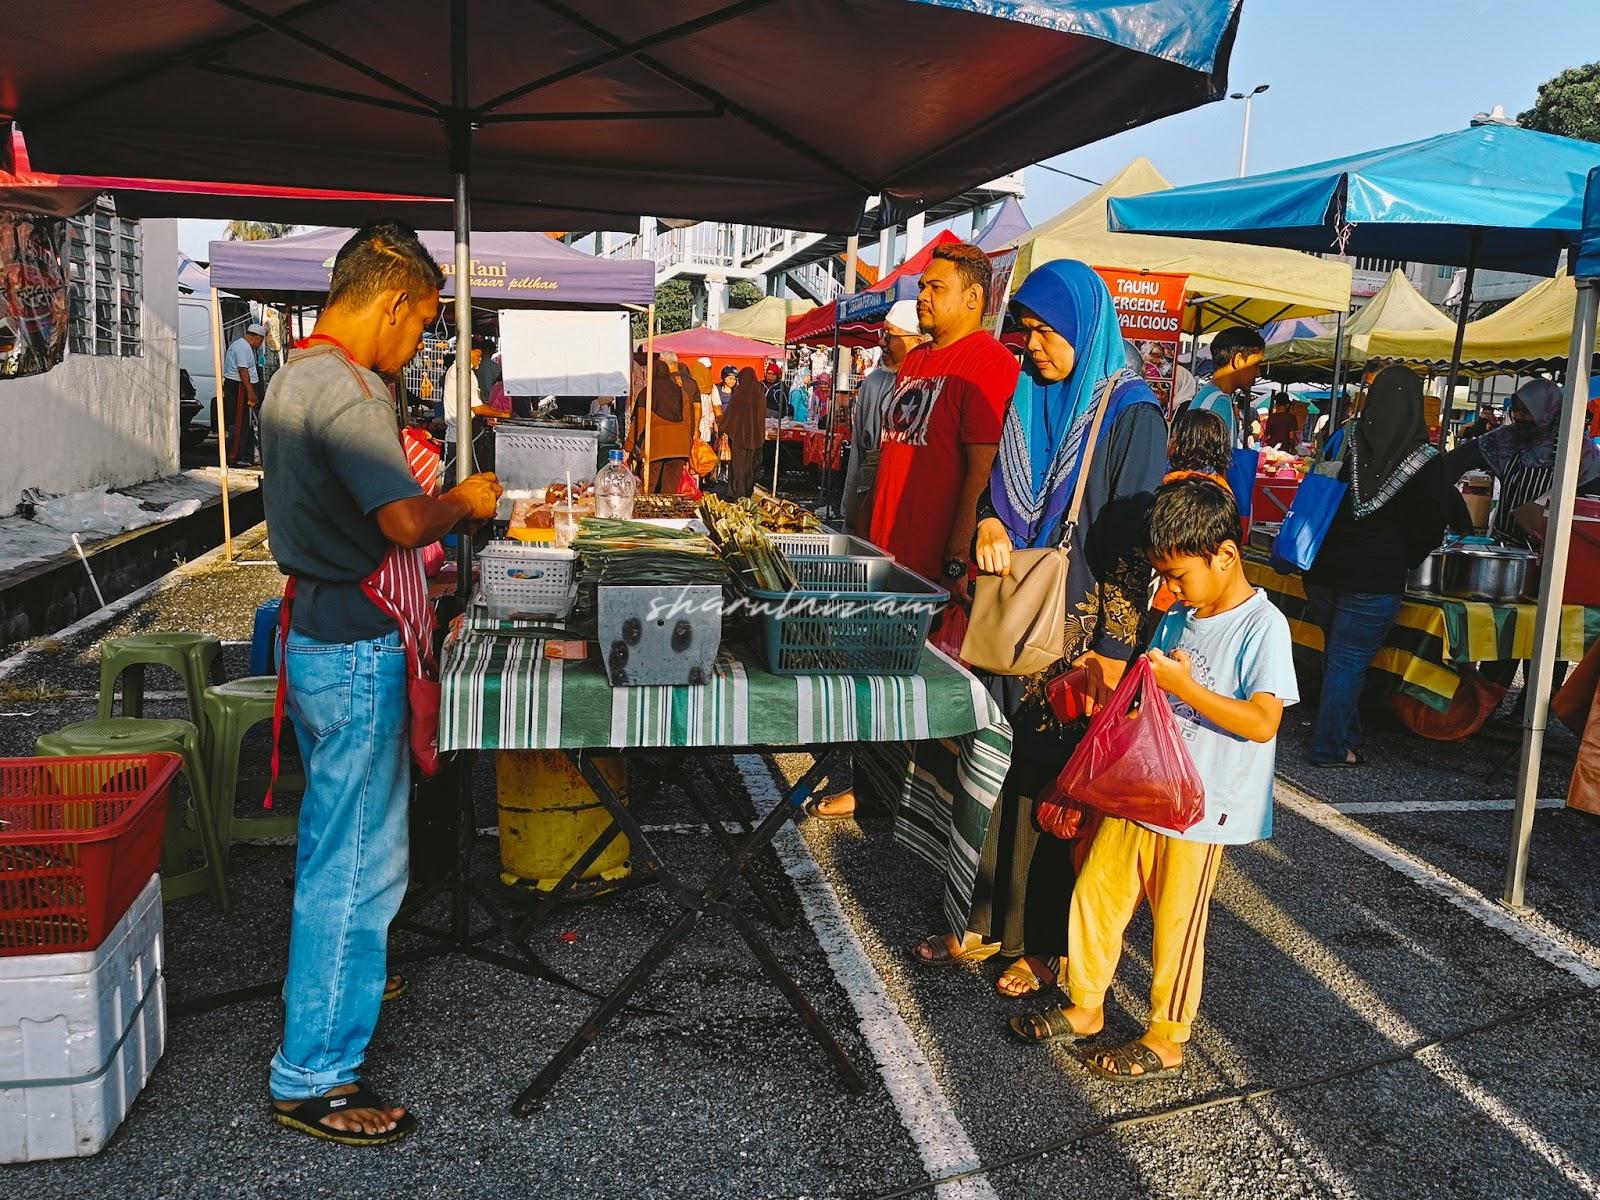 Pagi Sabtu di Pasar Tani Gombak Setia - Otak-otak